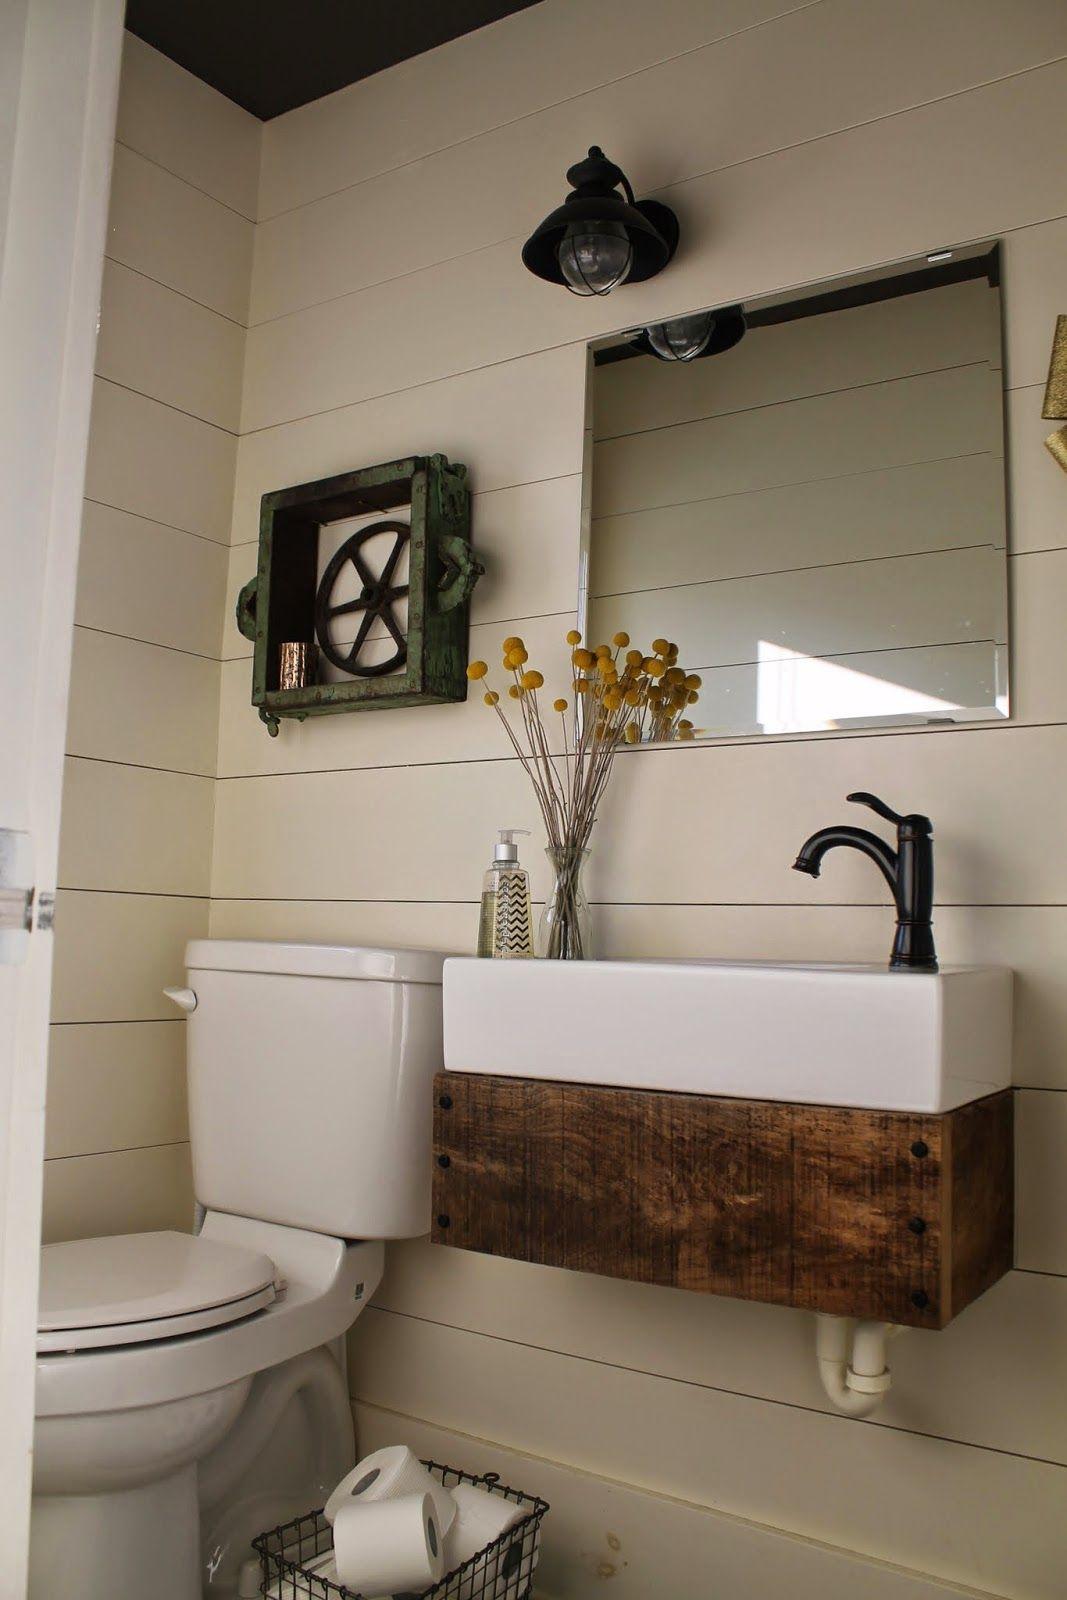 Rustic Reclaimed Wood Floating Vanity In Bathroom With Planked